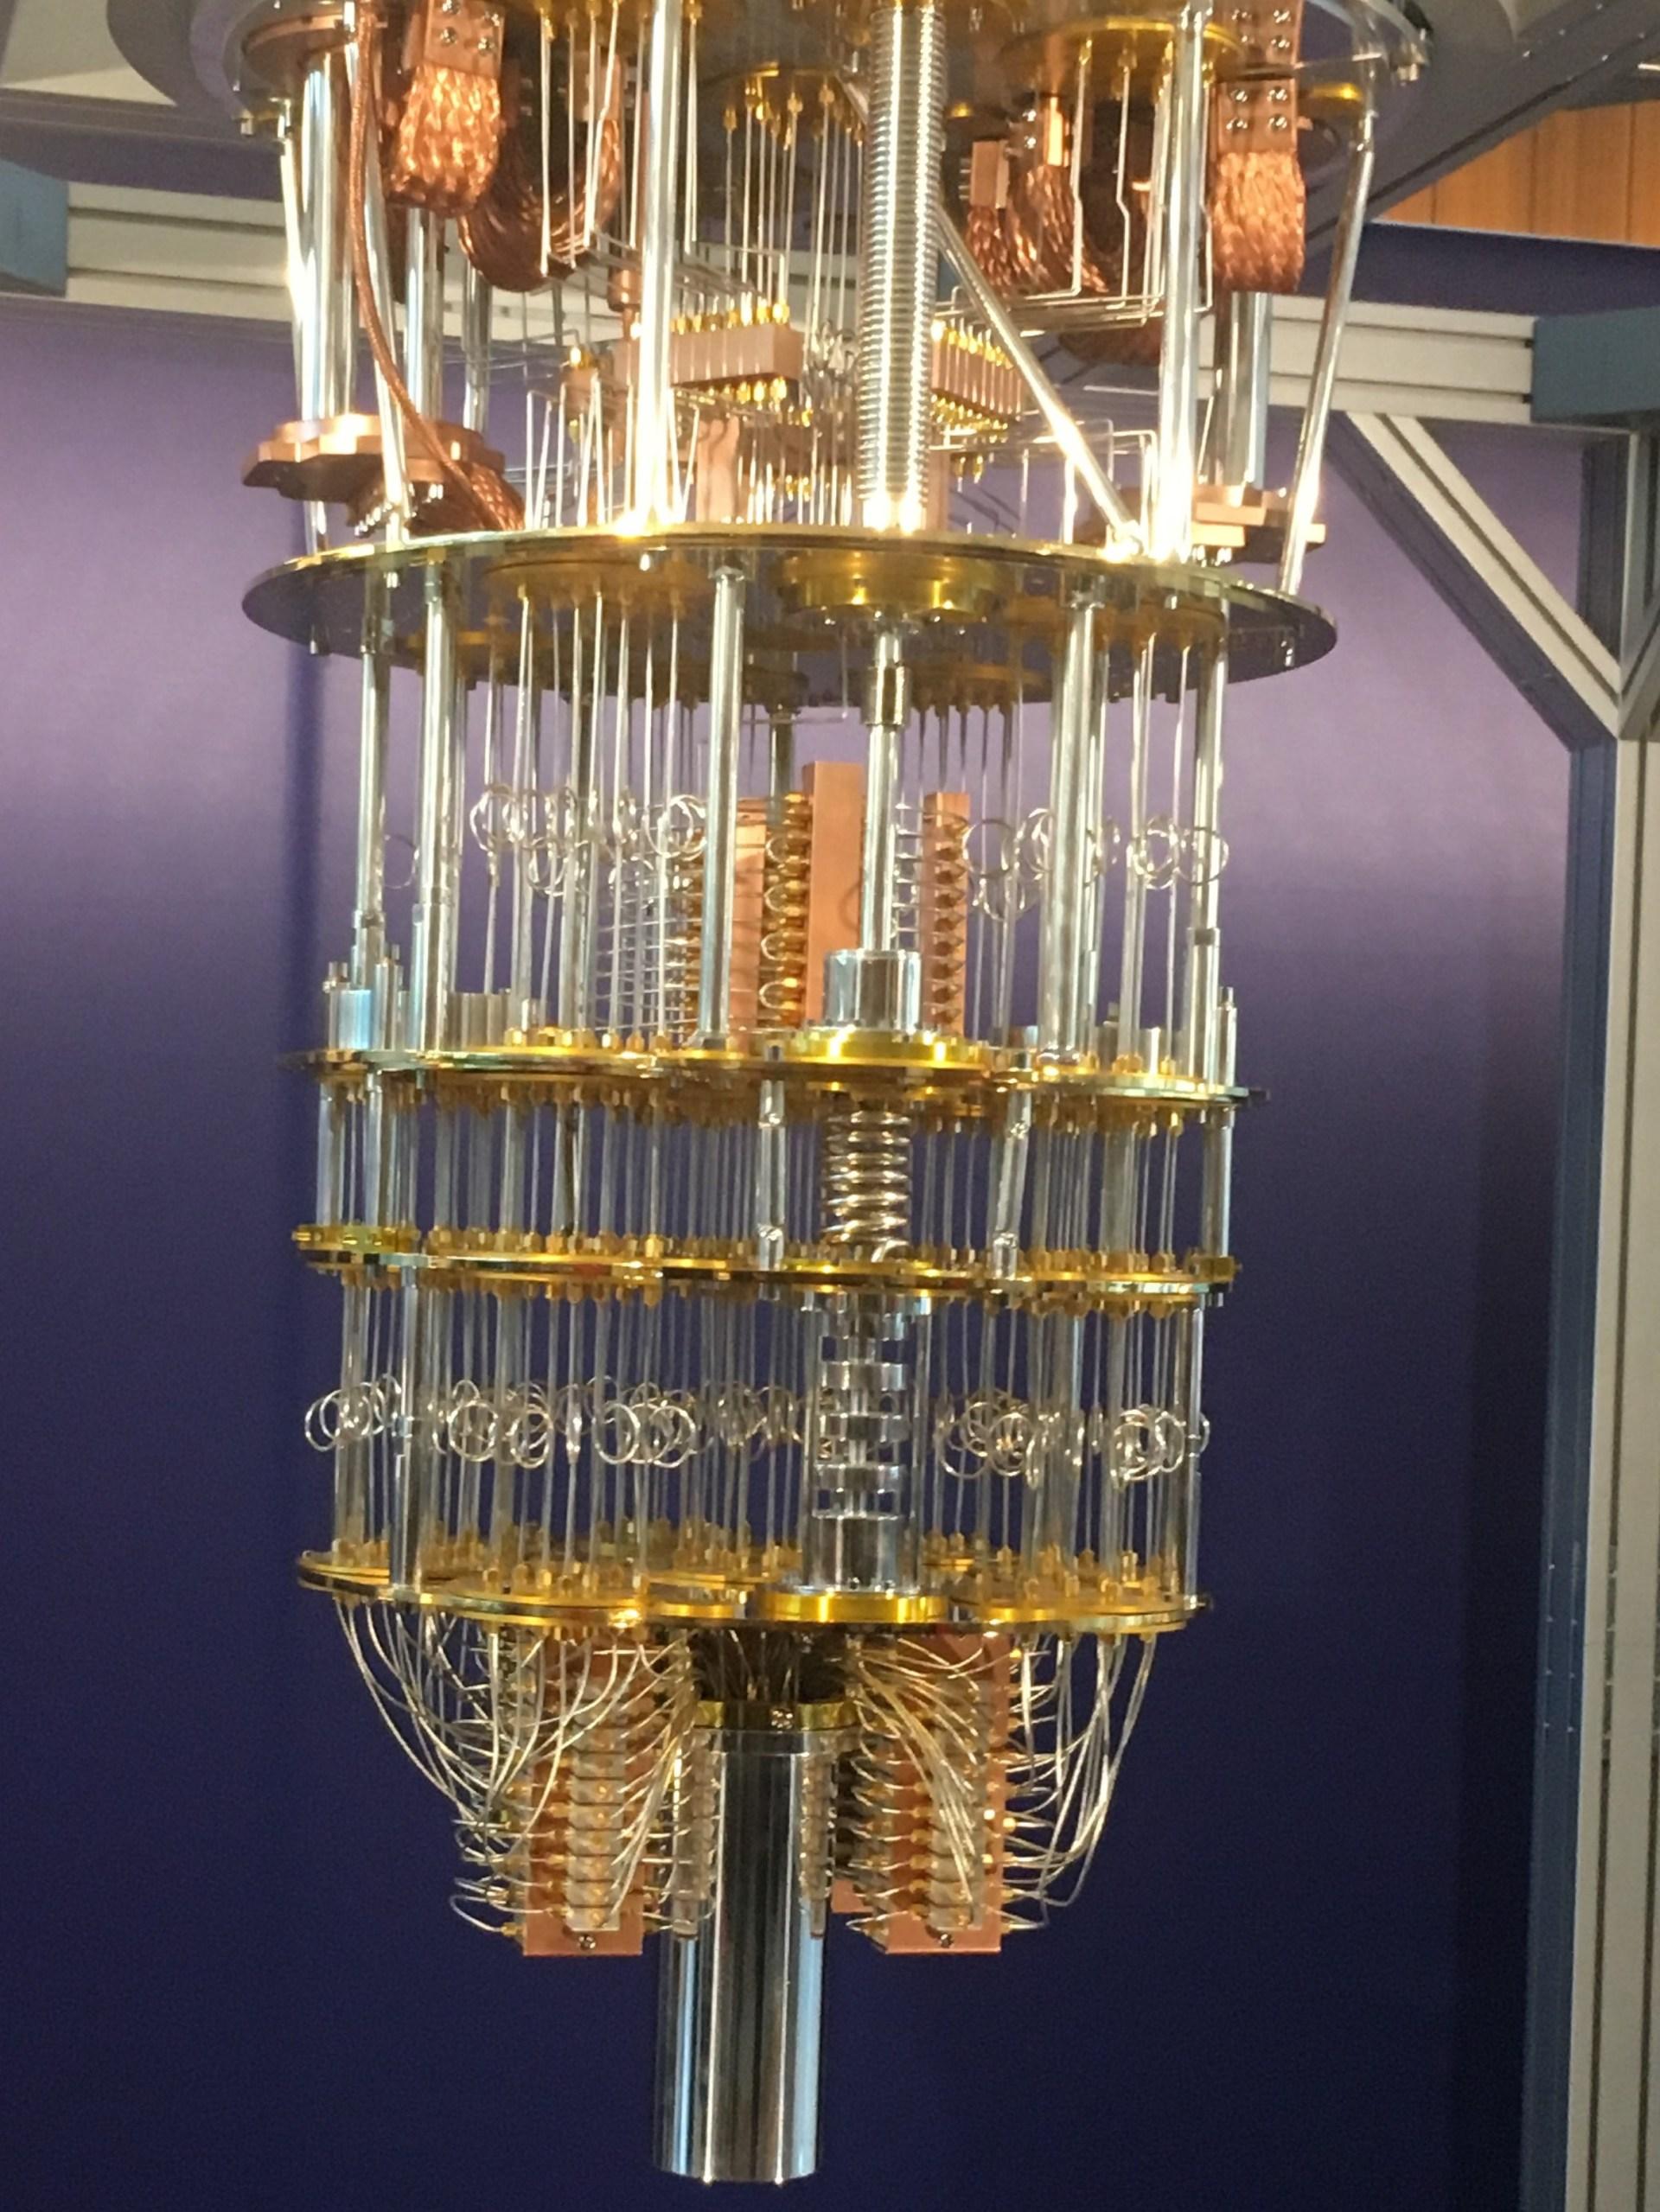 Model of the internals of IBM's Q (quantum) computer